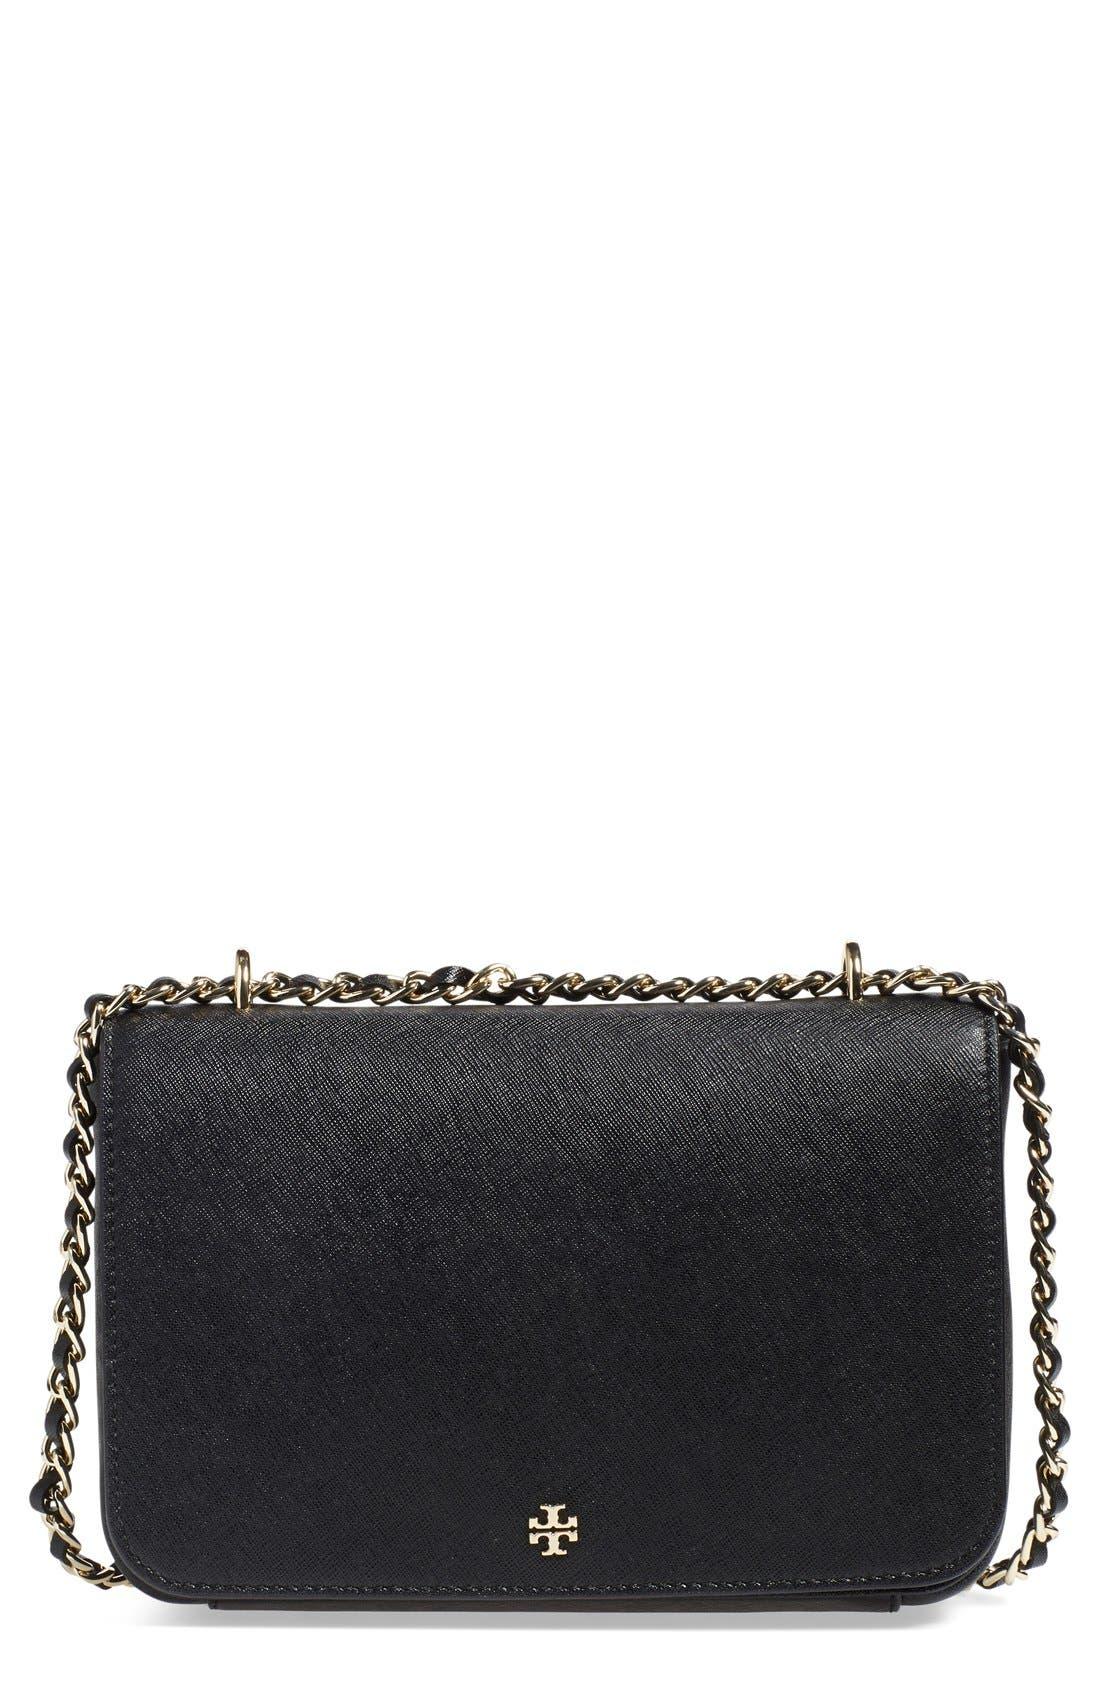 TORY BURCH, 'Robinson' Leather Convertible Shoulder Bag, Main thumbnail 1, color, 001